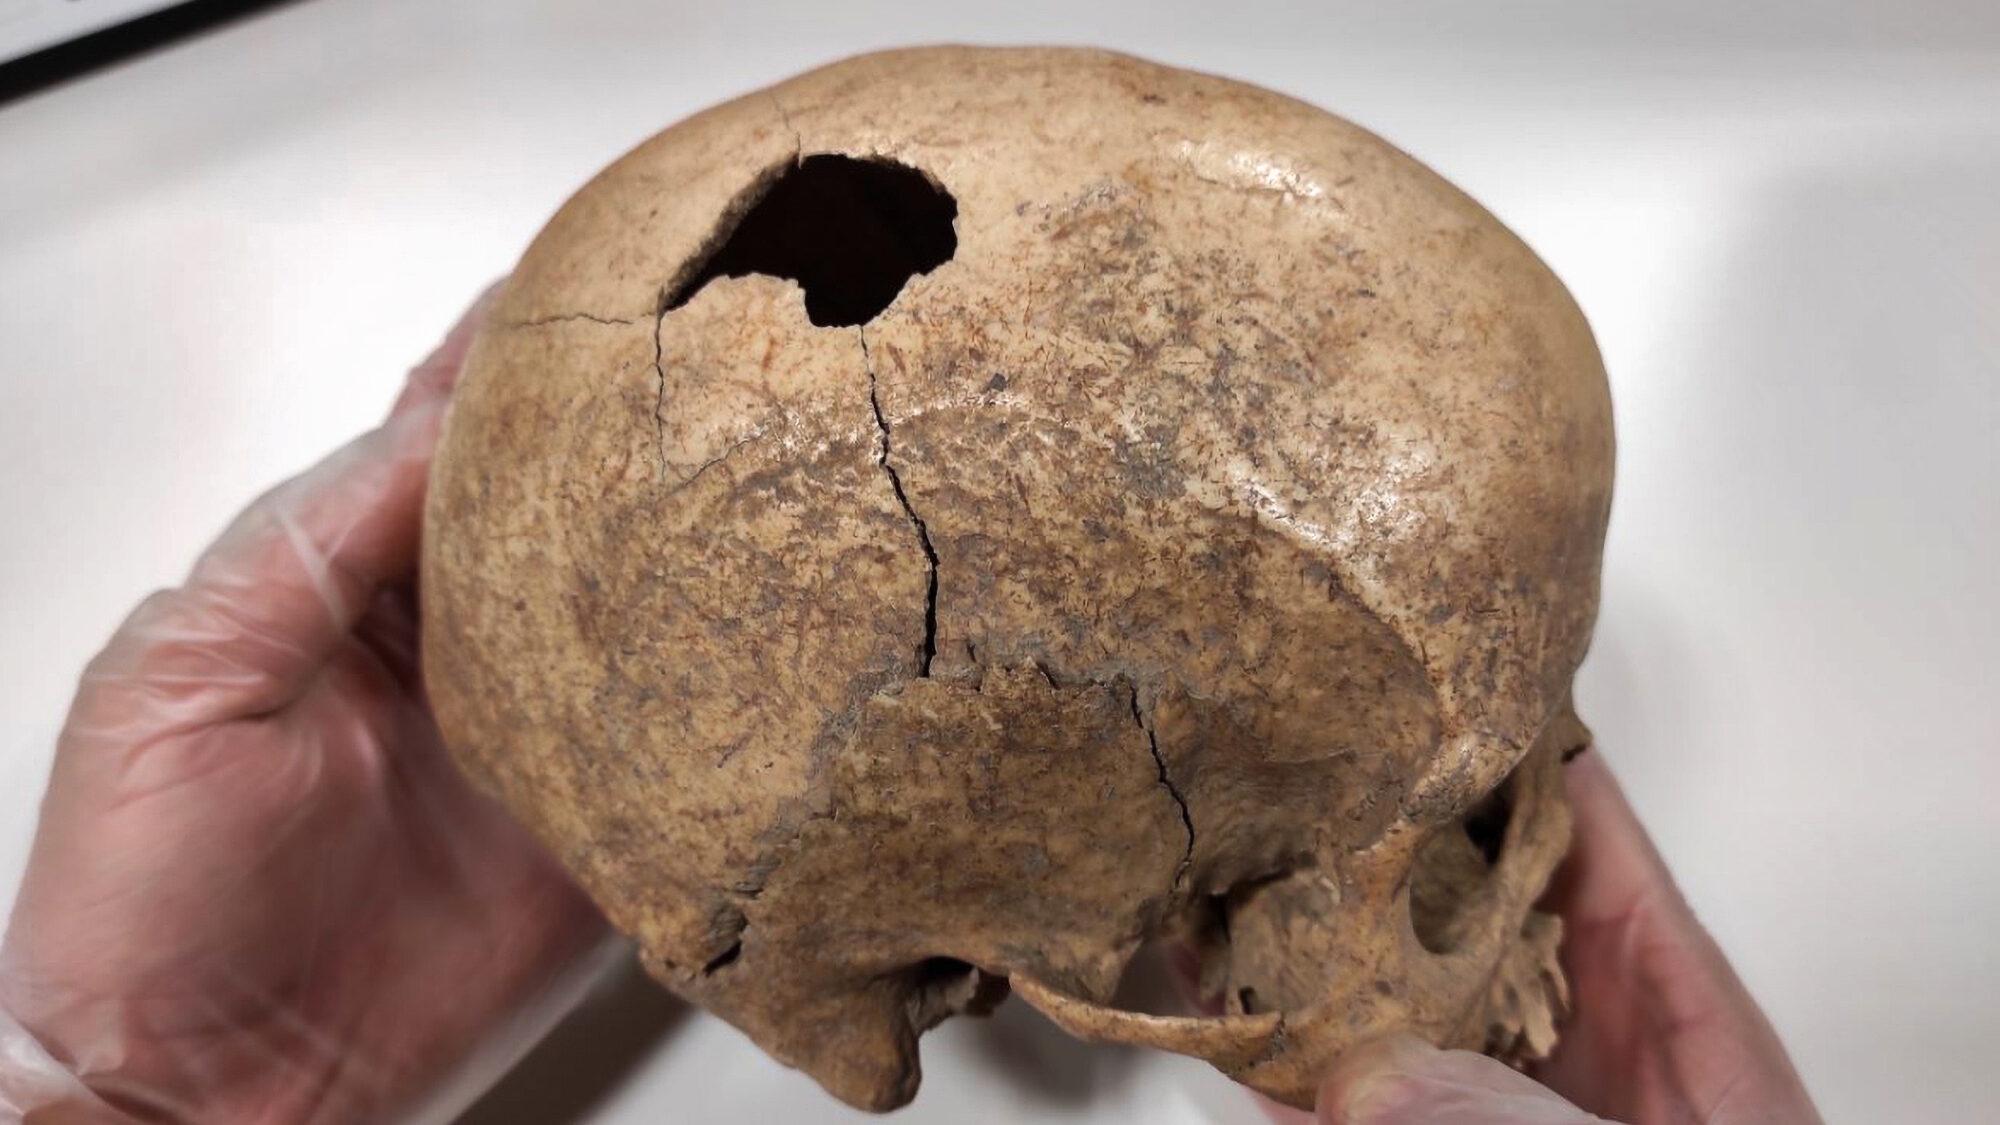 CSI Stone Age: Scientists Crack 5,000-Year-Old Murder Case